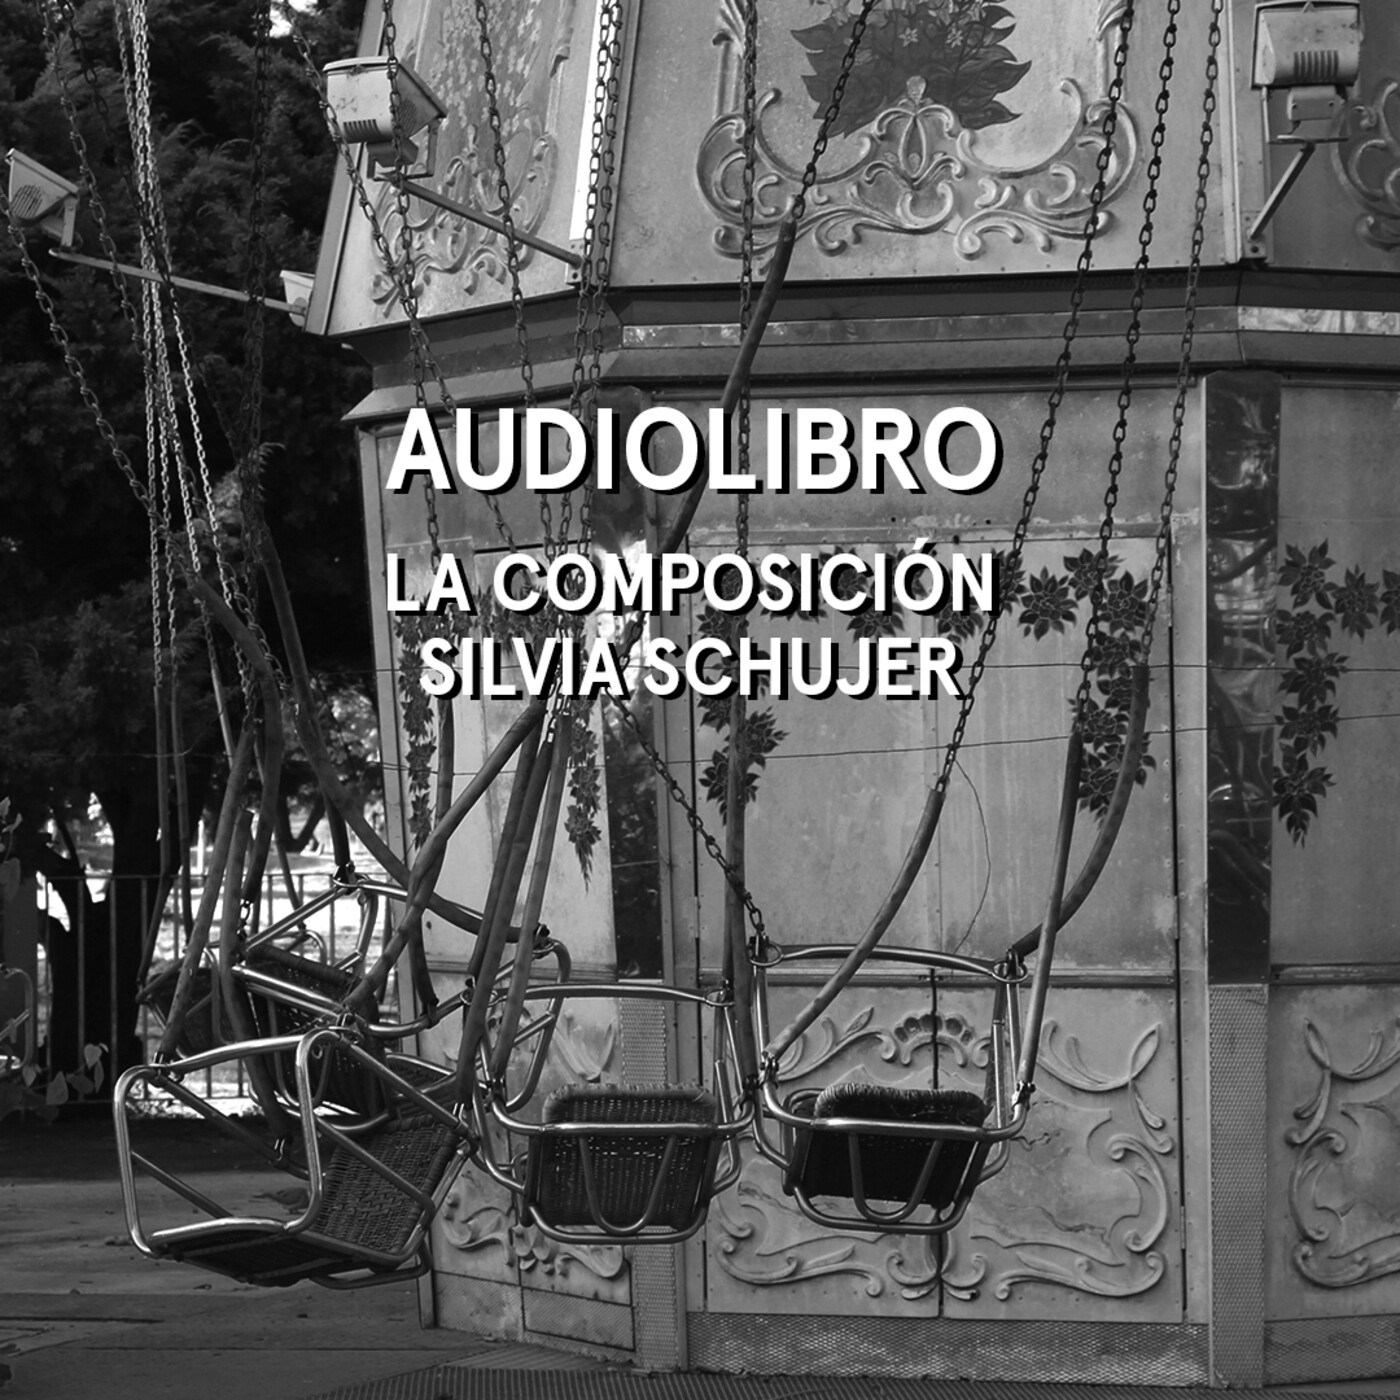 La composición - Silvia Schujer